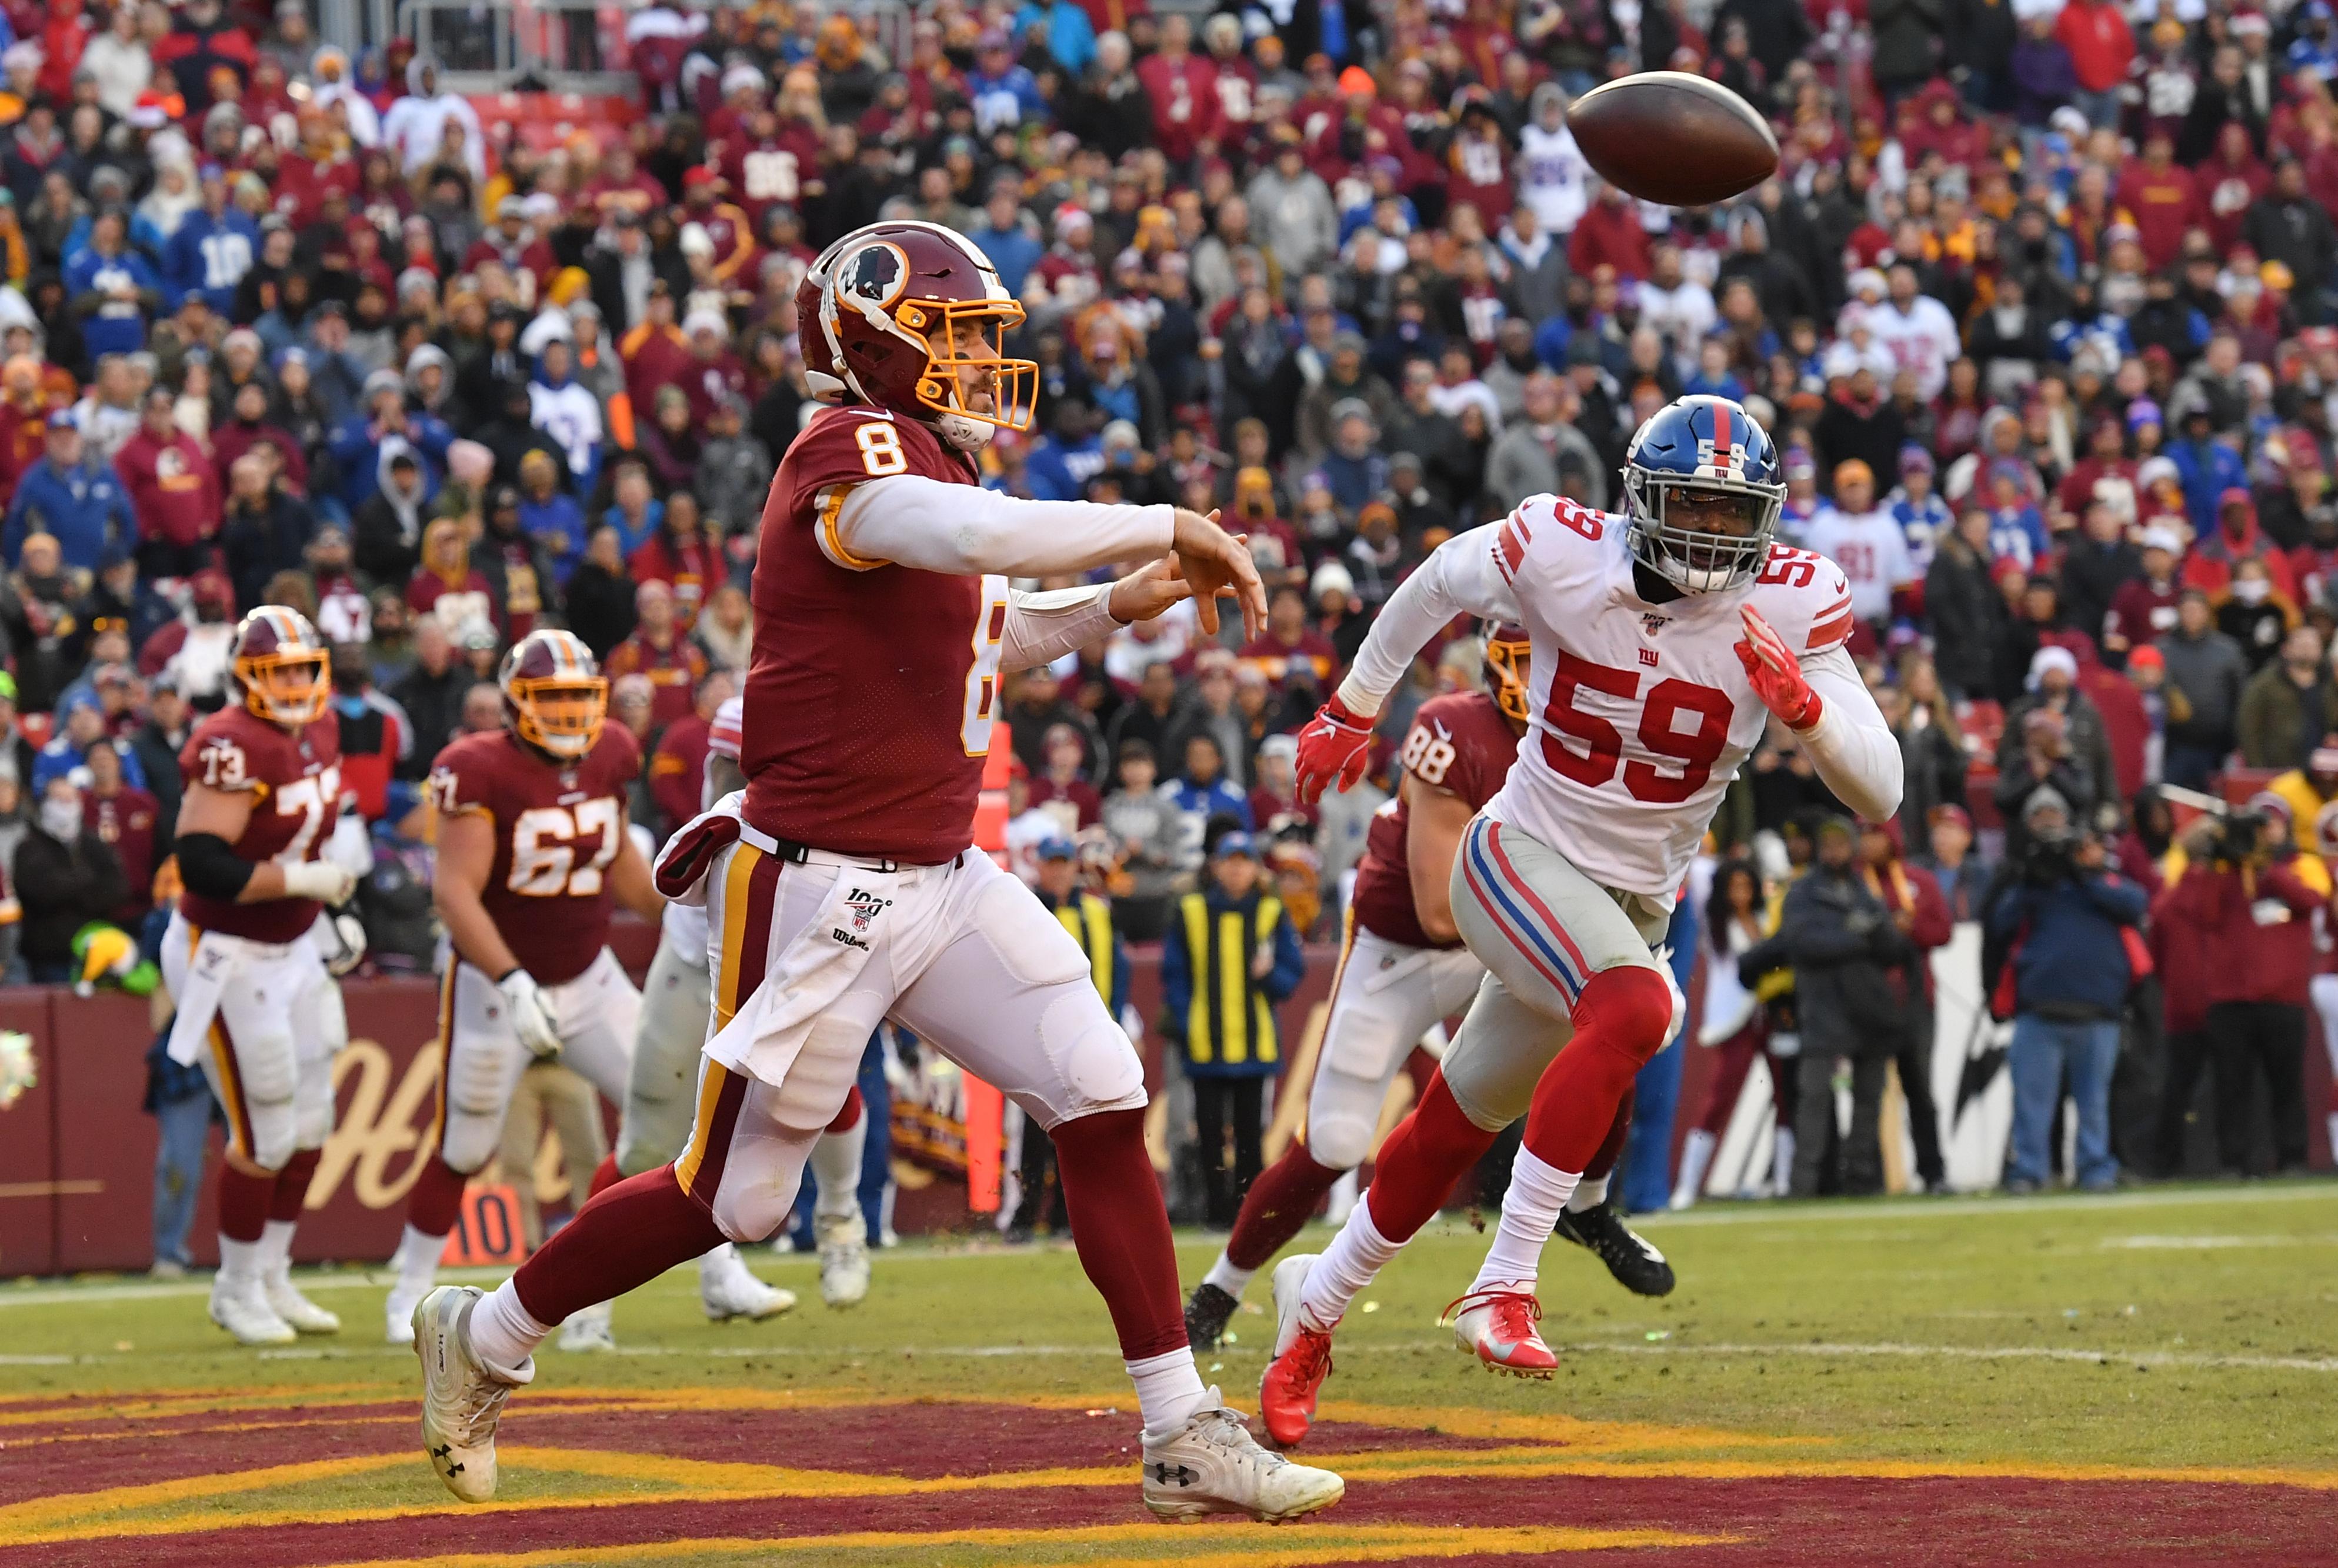 NFL - New York Giants at Washington Redskins